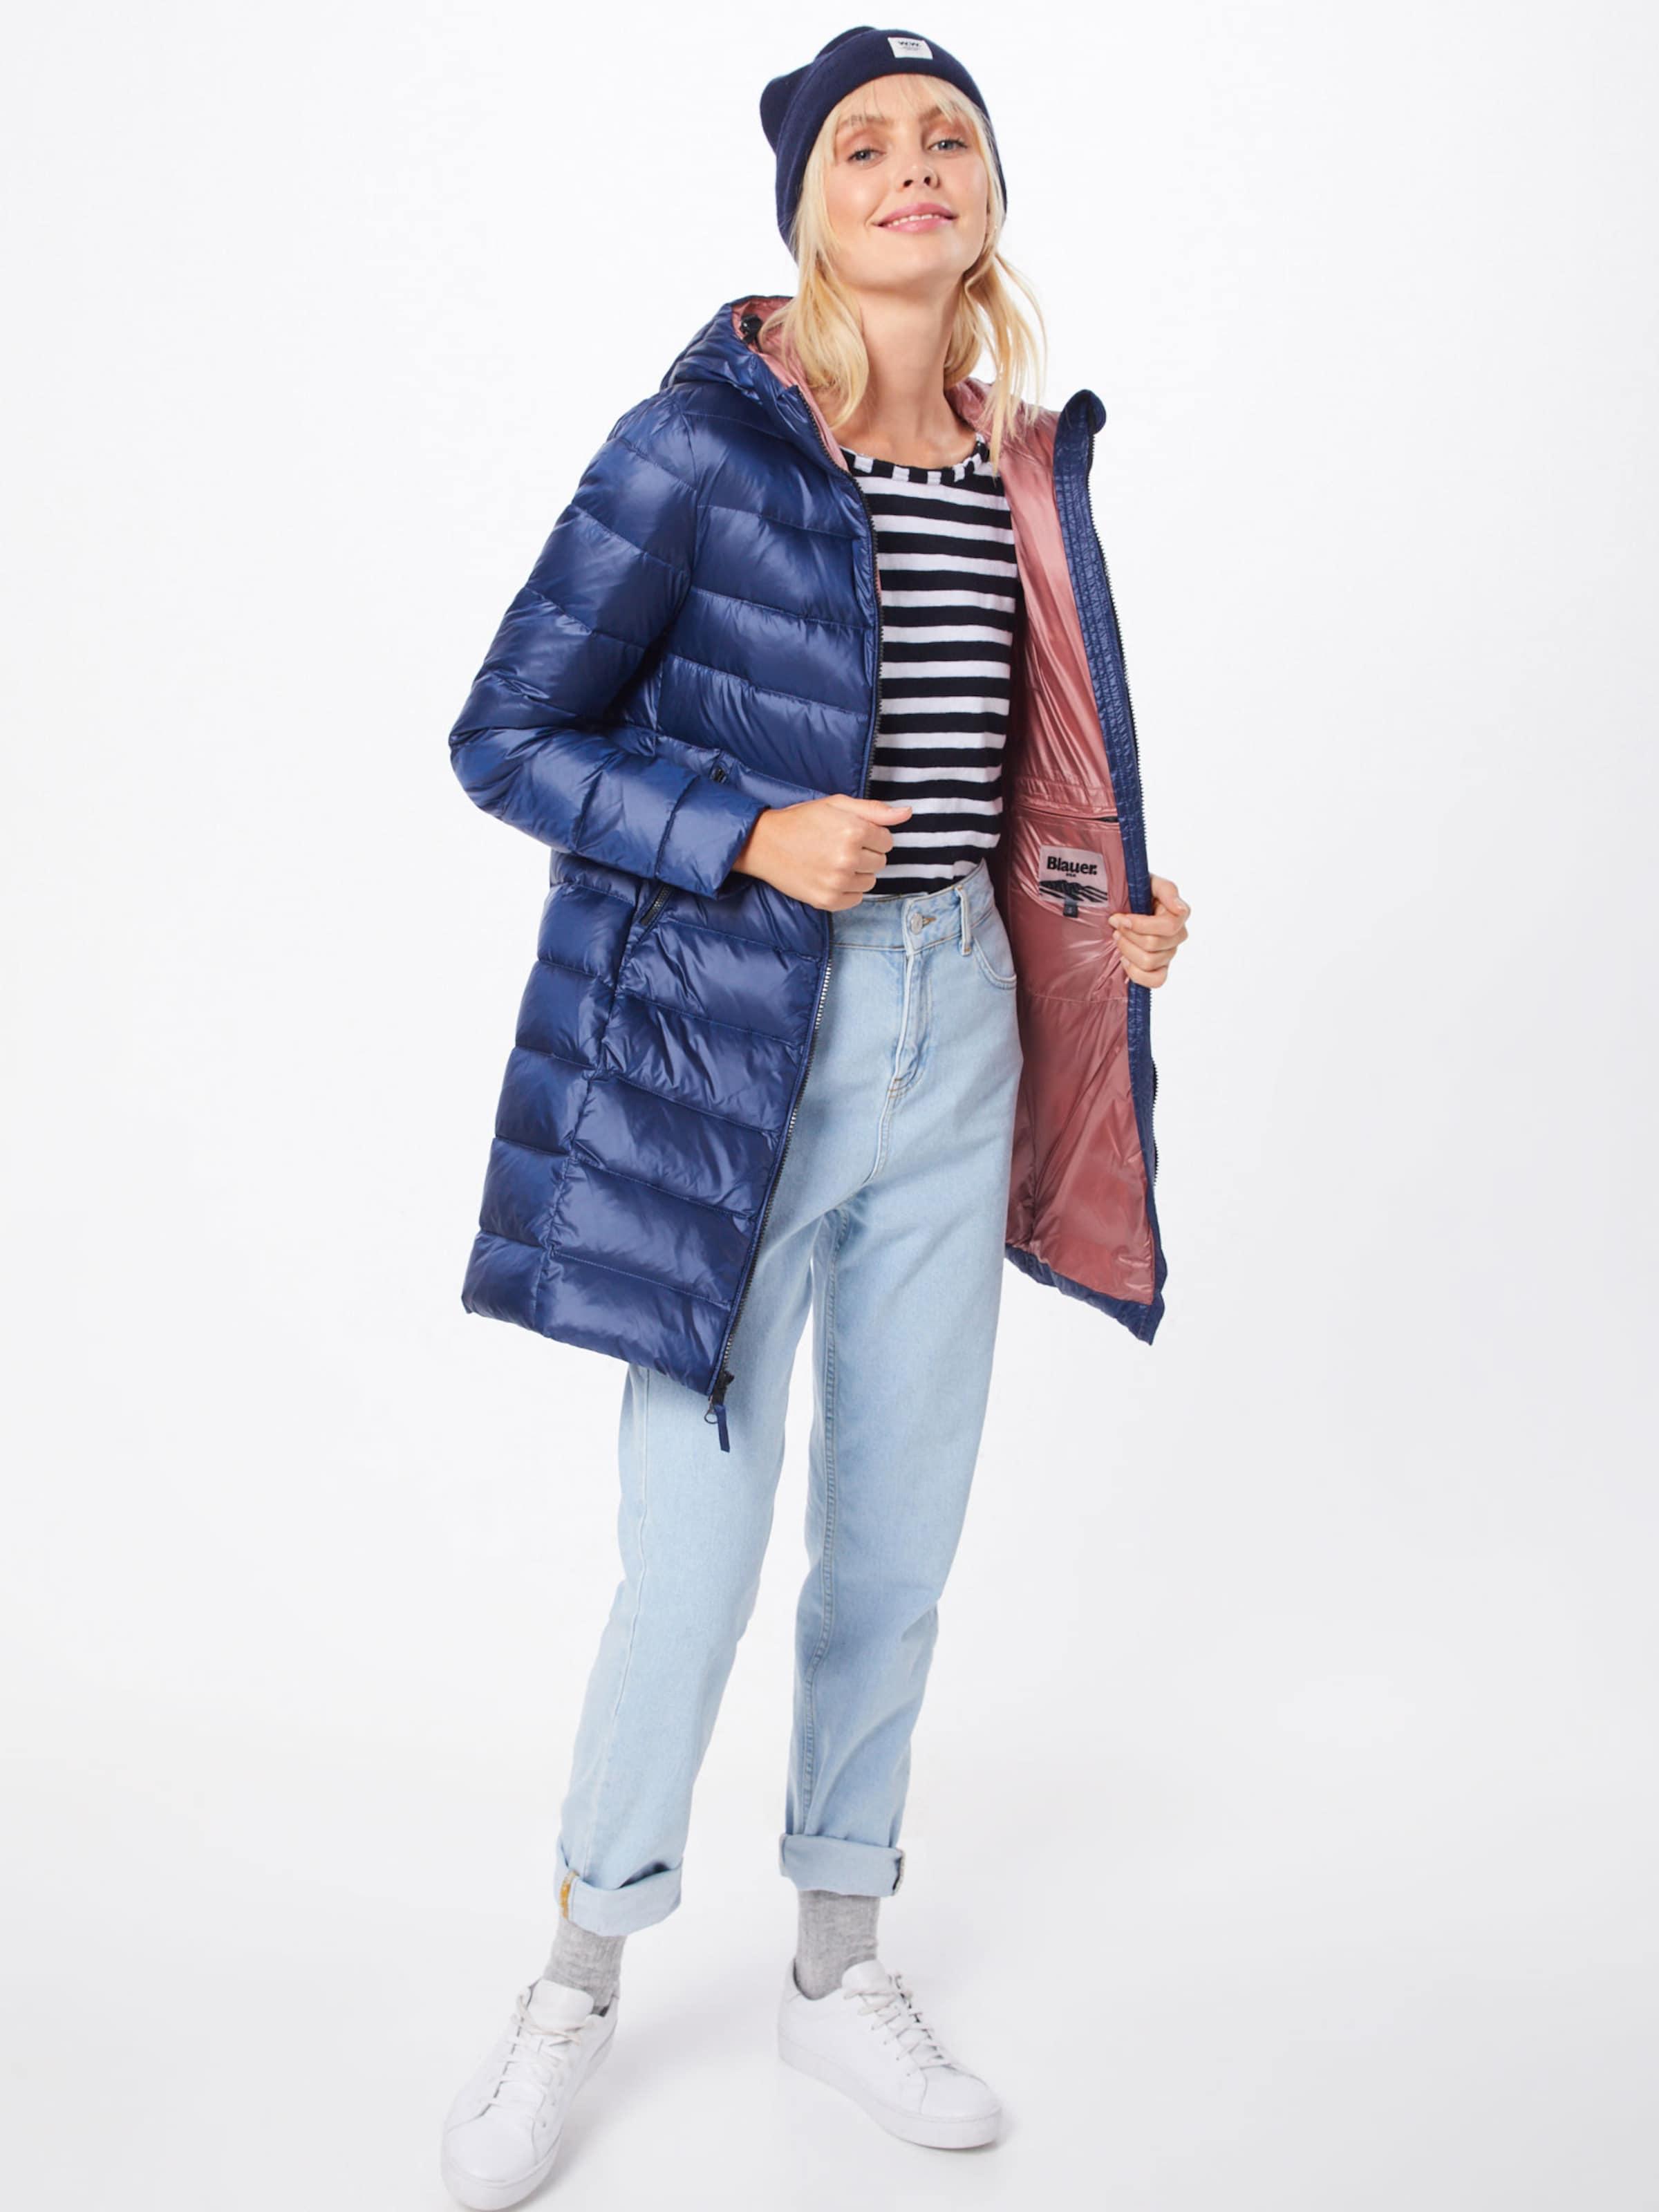 Manteau D'hiver En Imbottito Piuma' Noir 'impermeabile Blauer Lunghi usa f6Y7gIvby